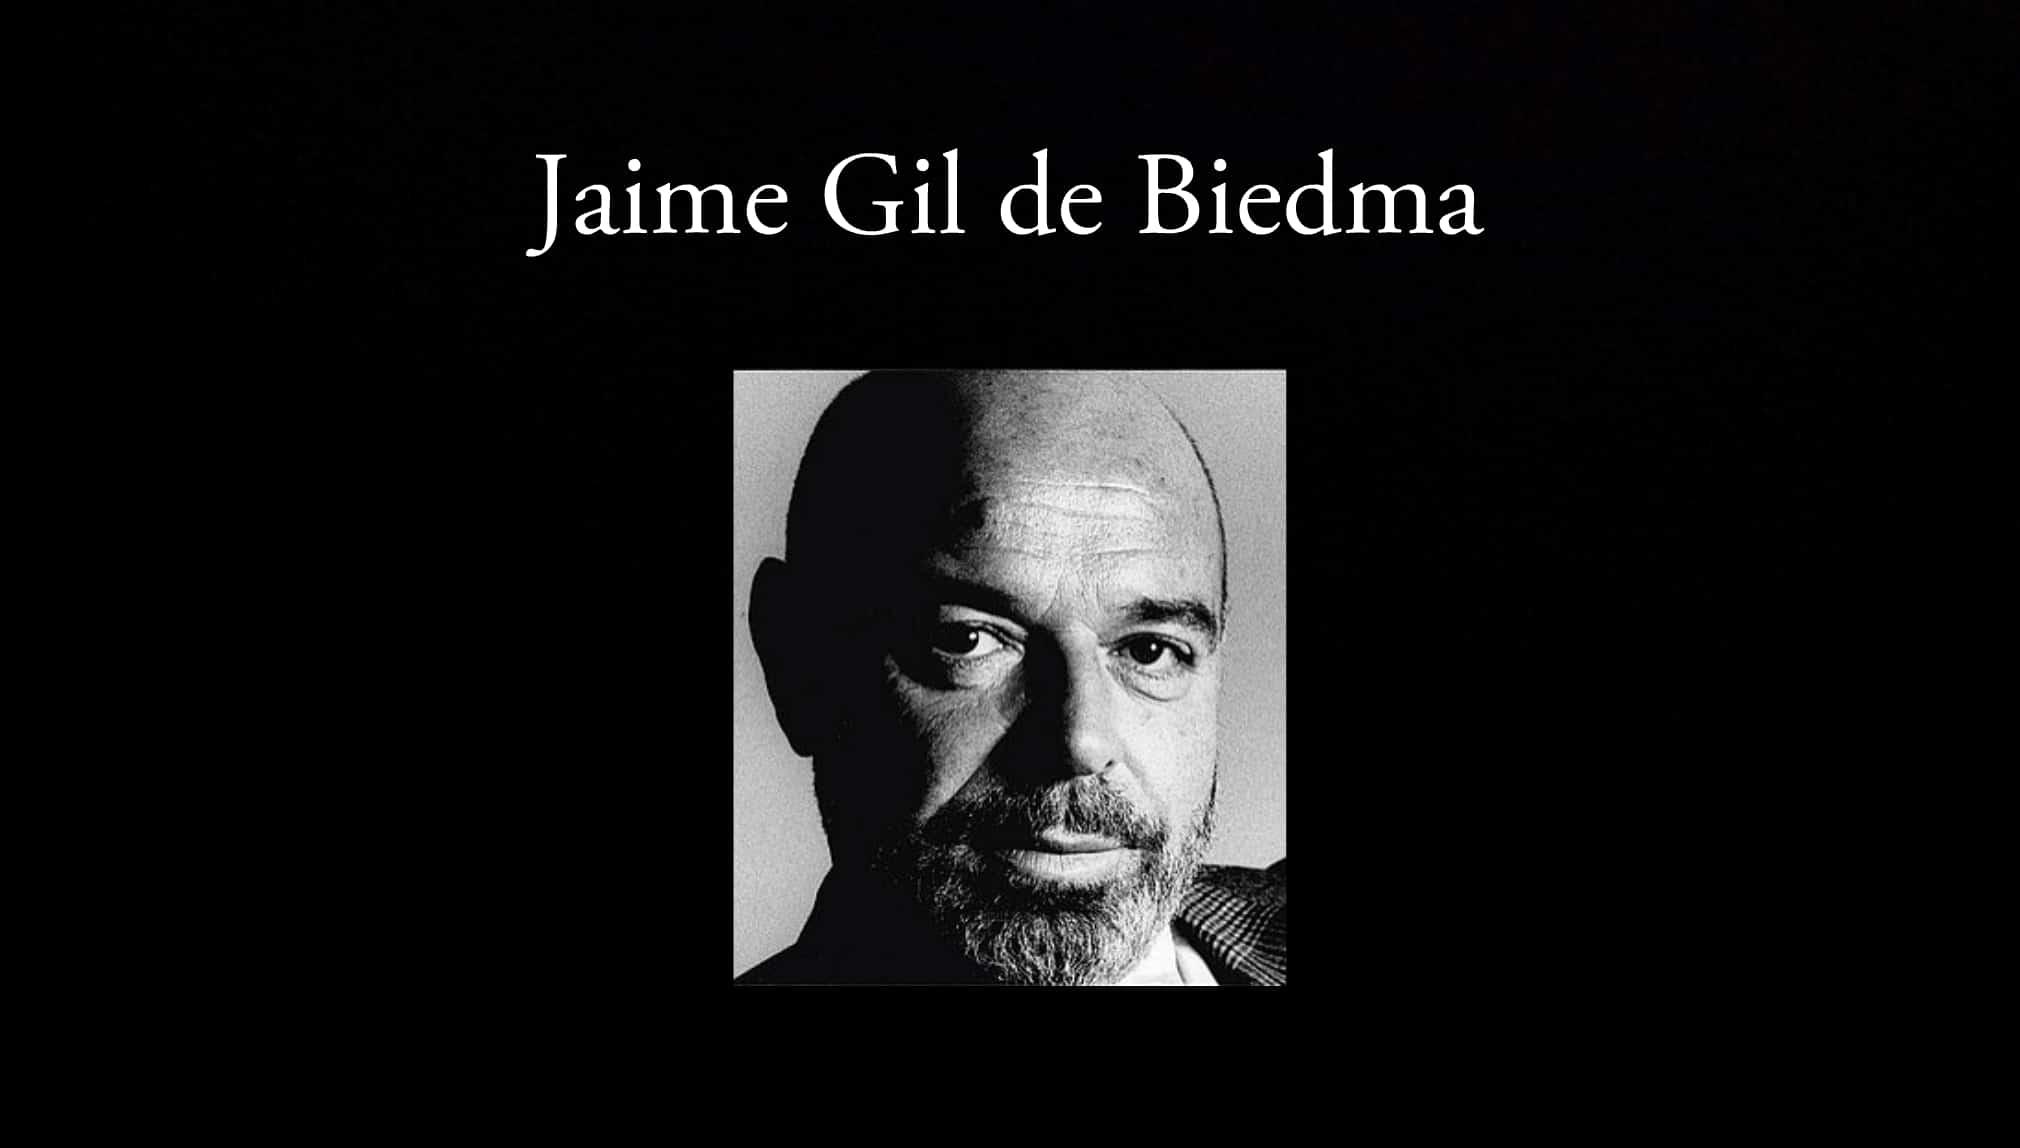 Jaime Gil de Biedma.